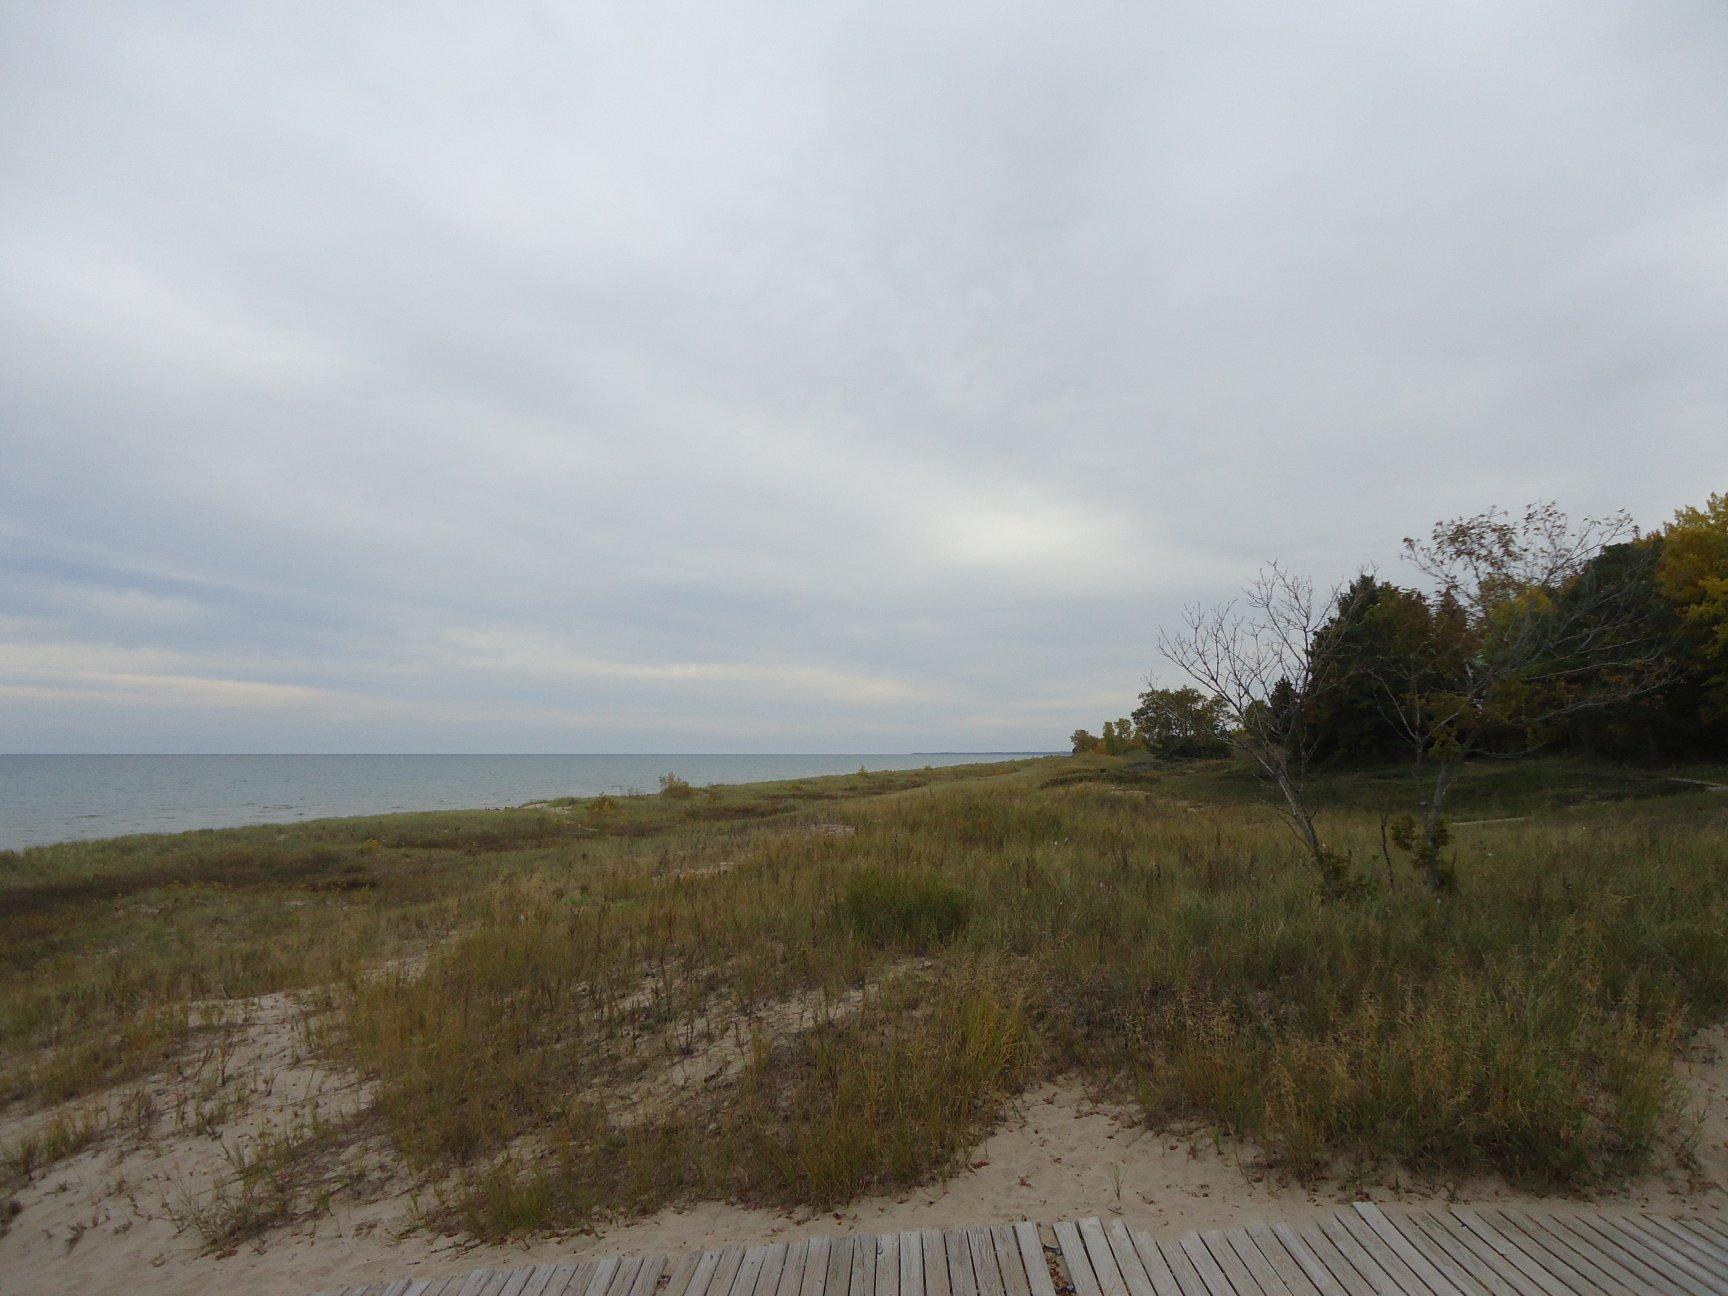 Windswept shore of lake michigan photo